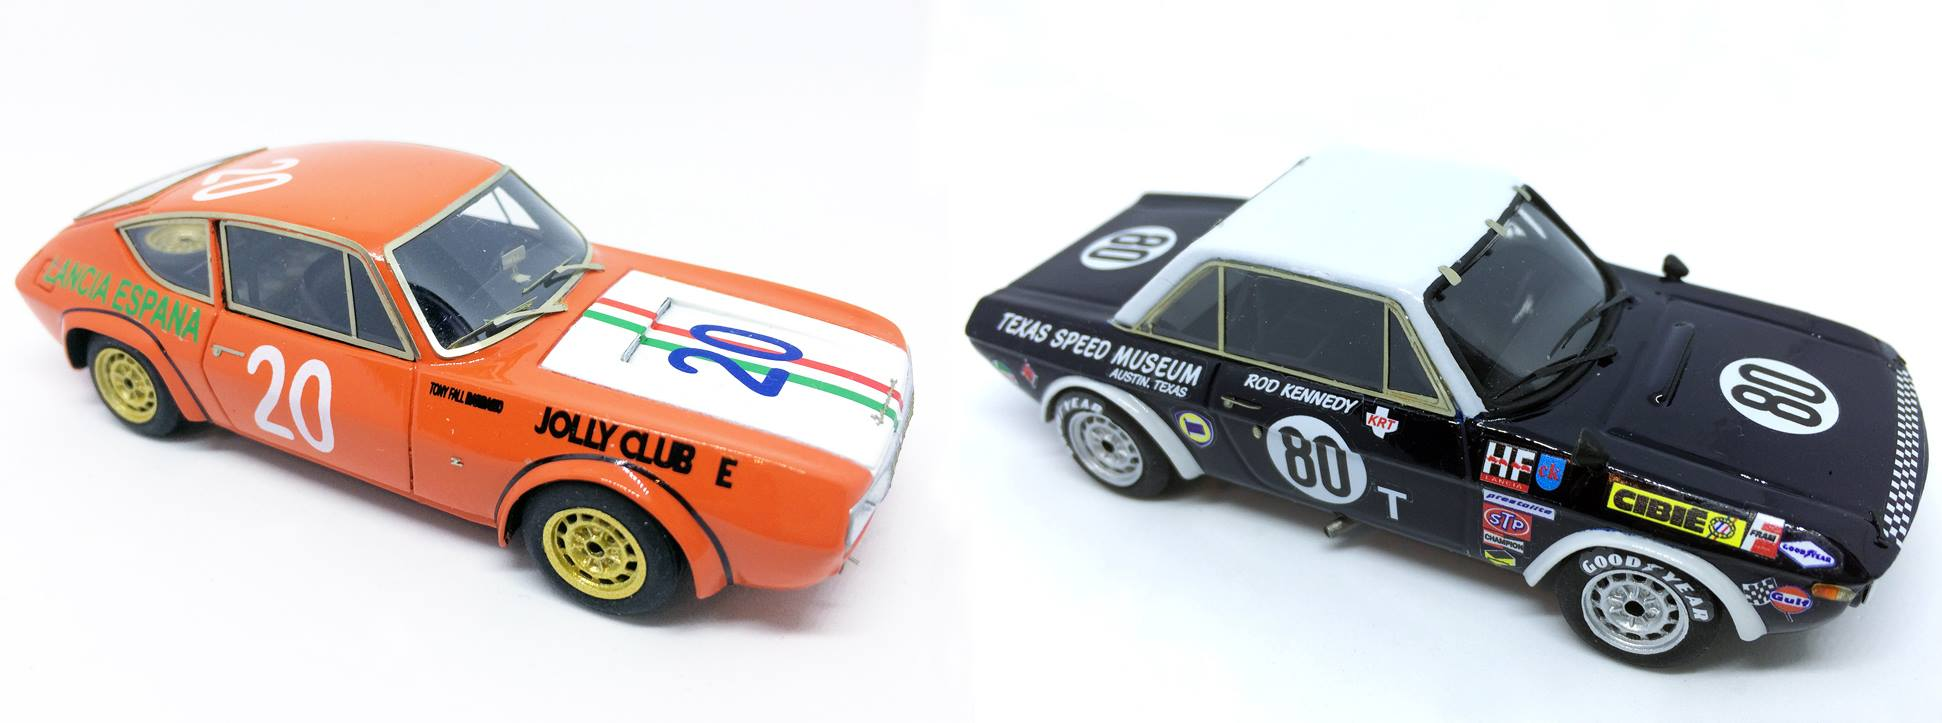 Lancia-model-4